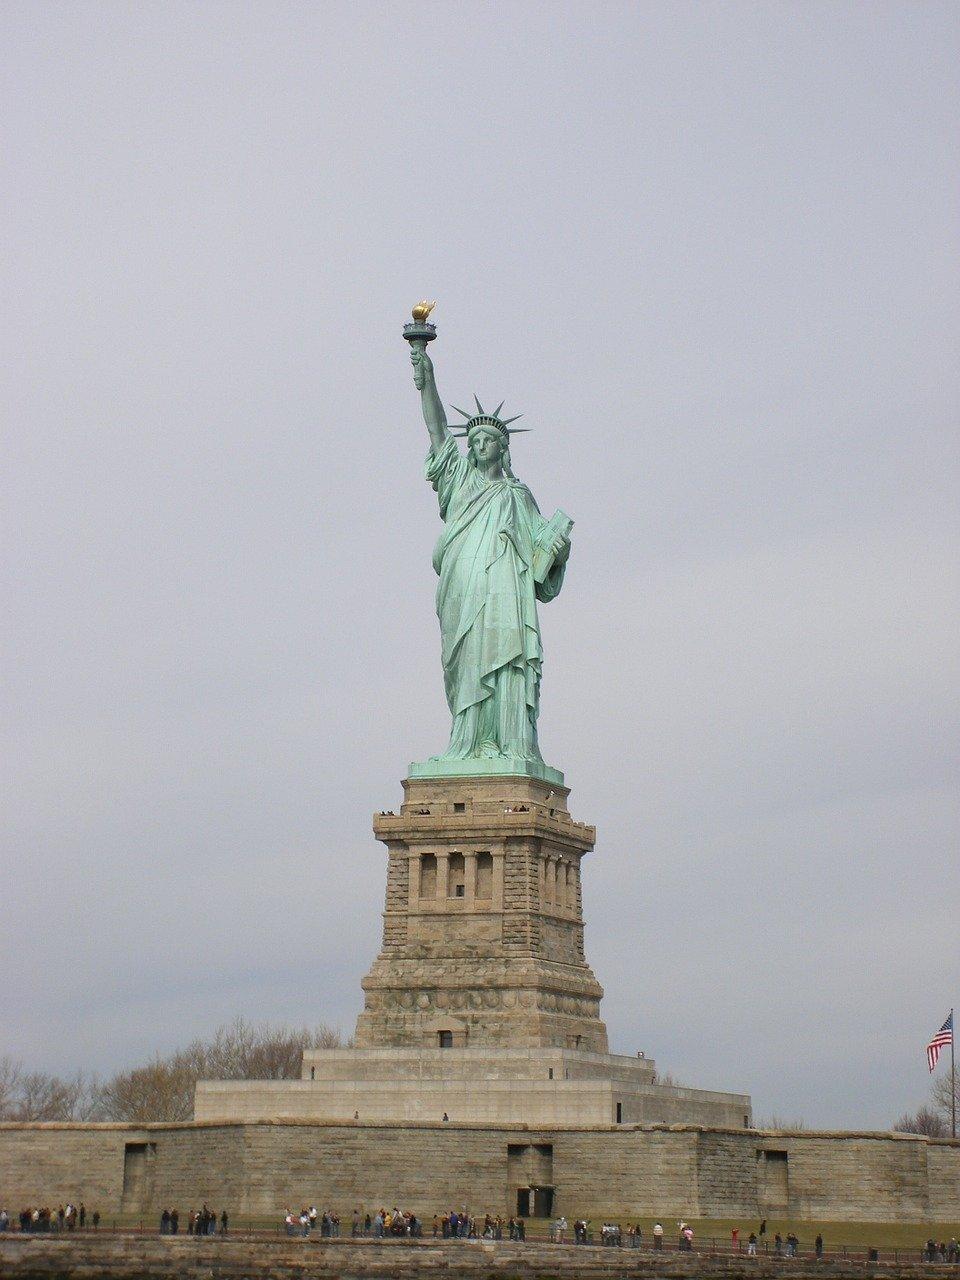 billet-coupe-file-ferry-statut-de-la-liberte